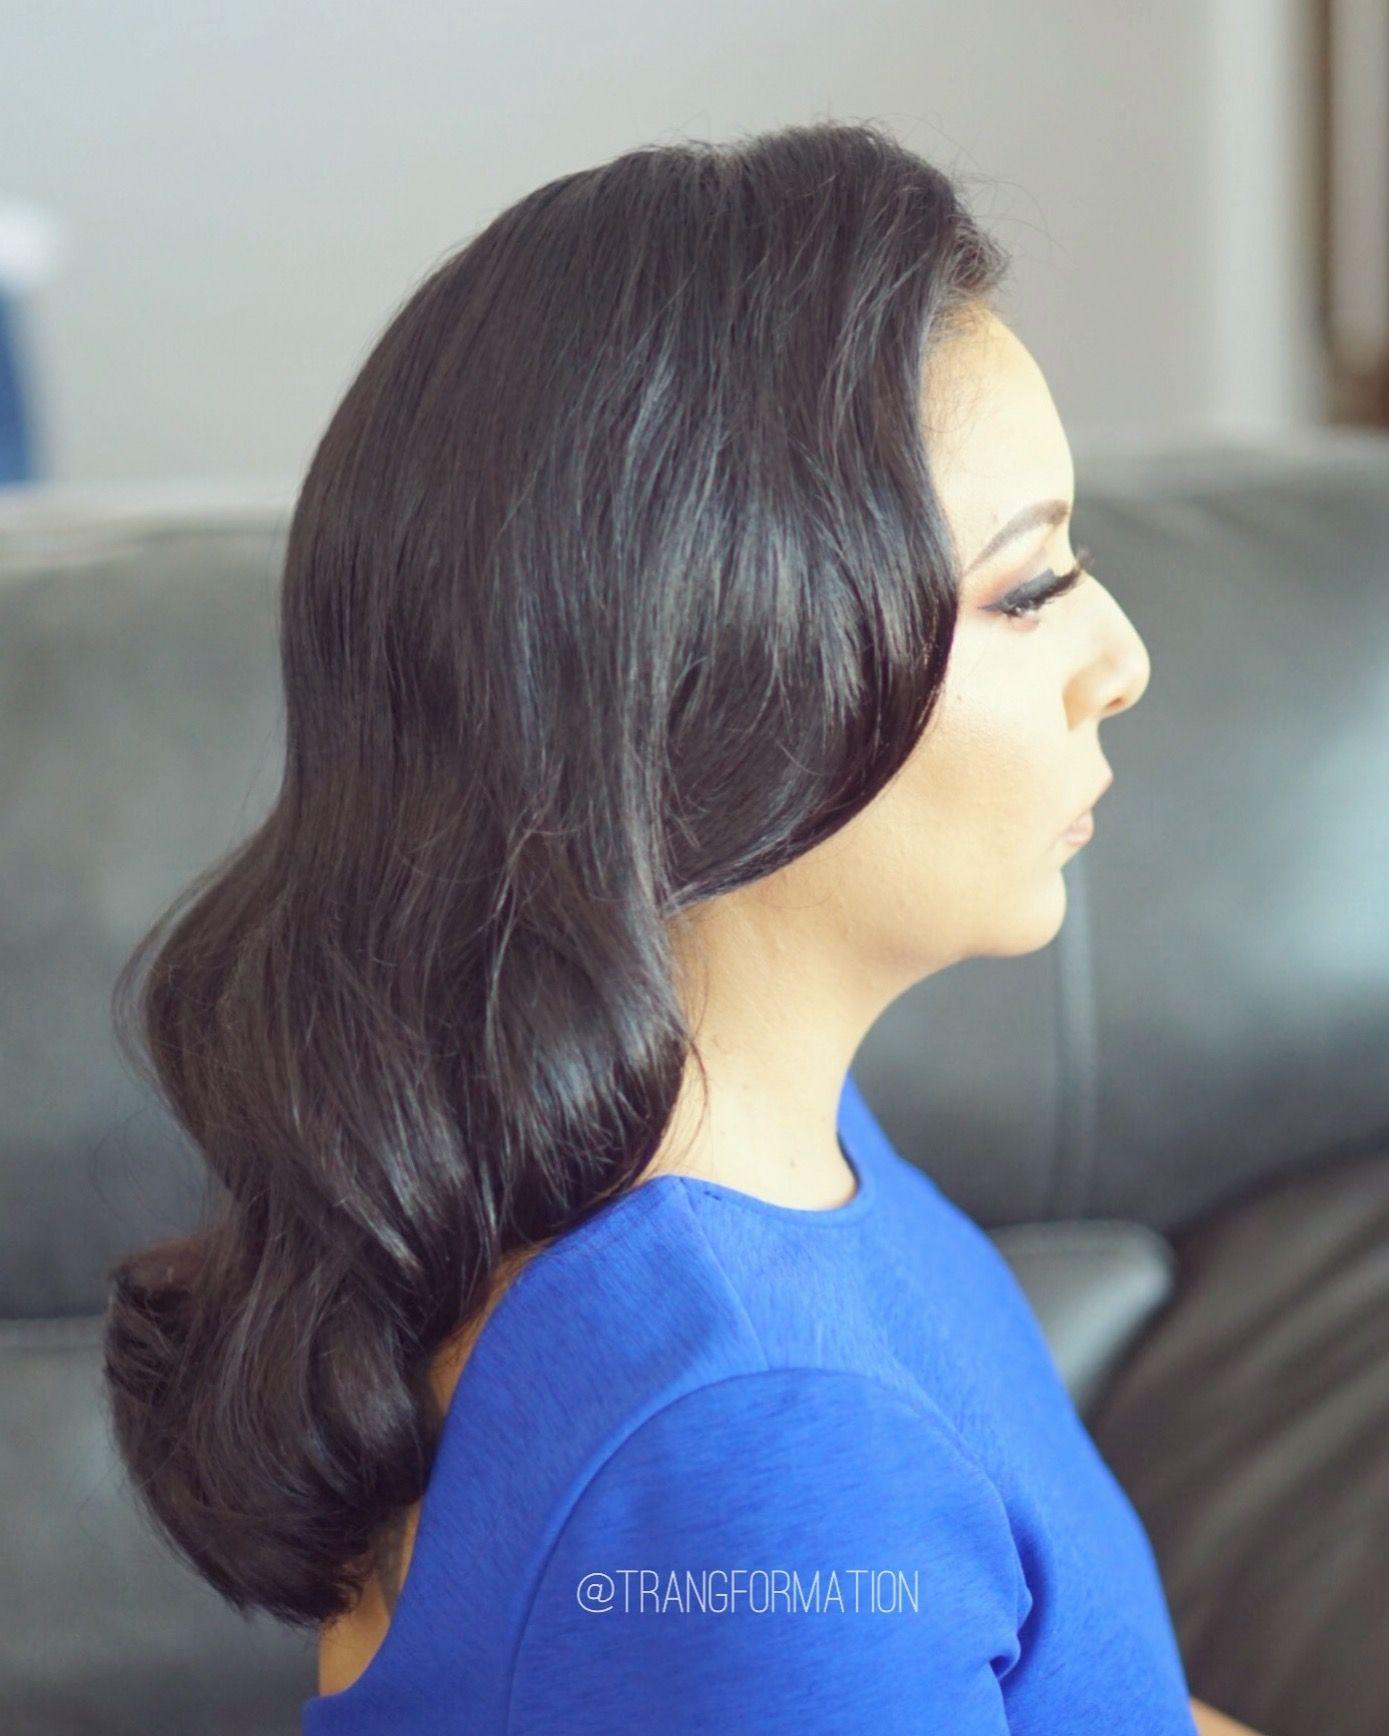 Hair, waves, Hollywood glam, glamorous hairstyle, bridal ...